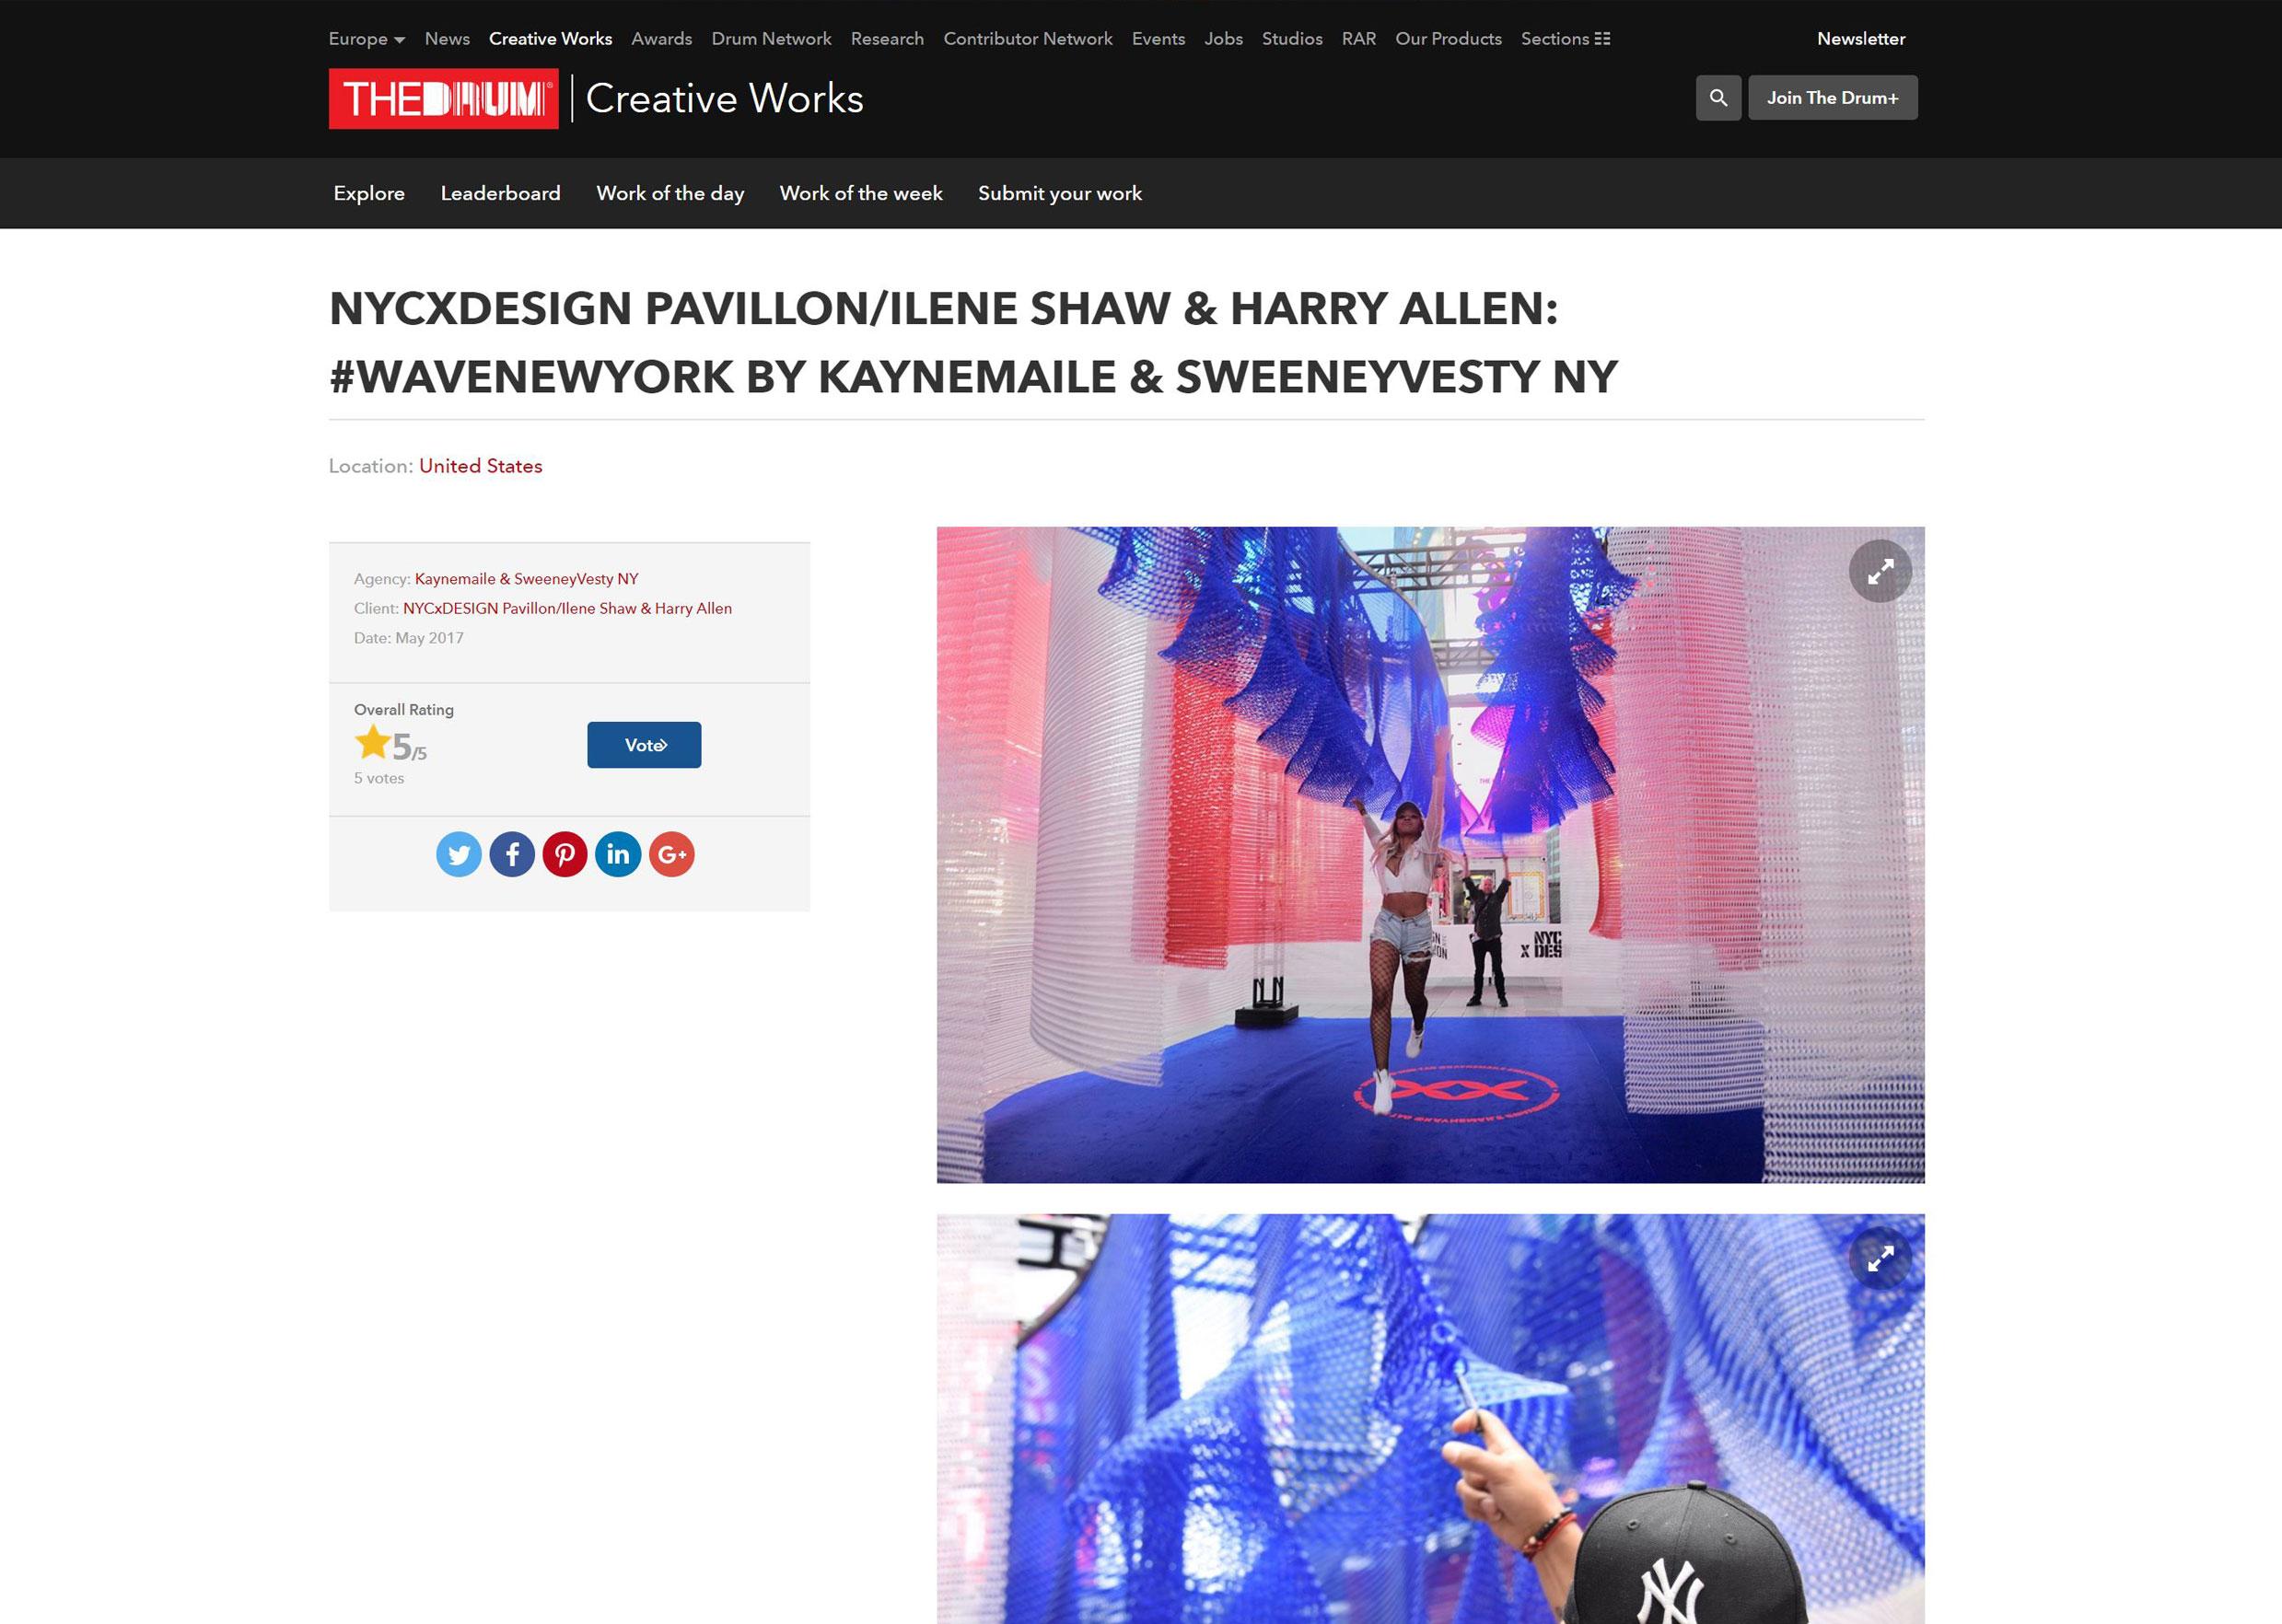 Kaynemaile #wavenewyork installation with Ned Kahn on The Drum